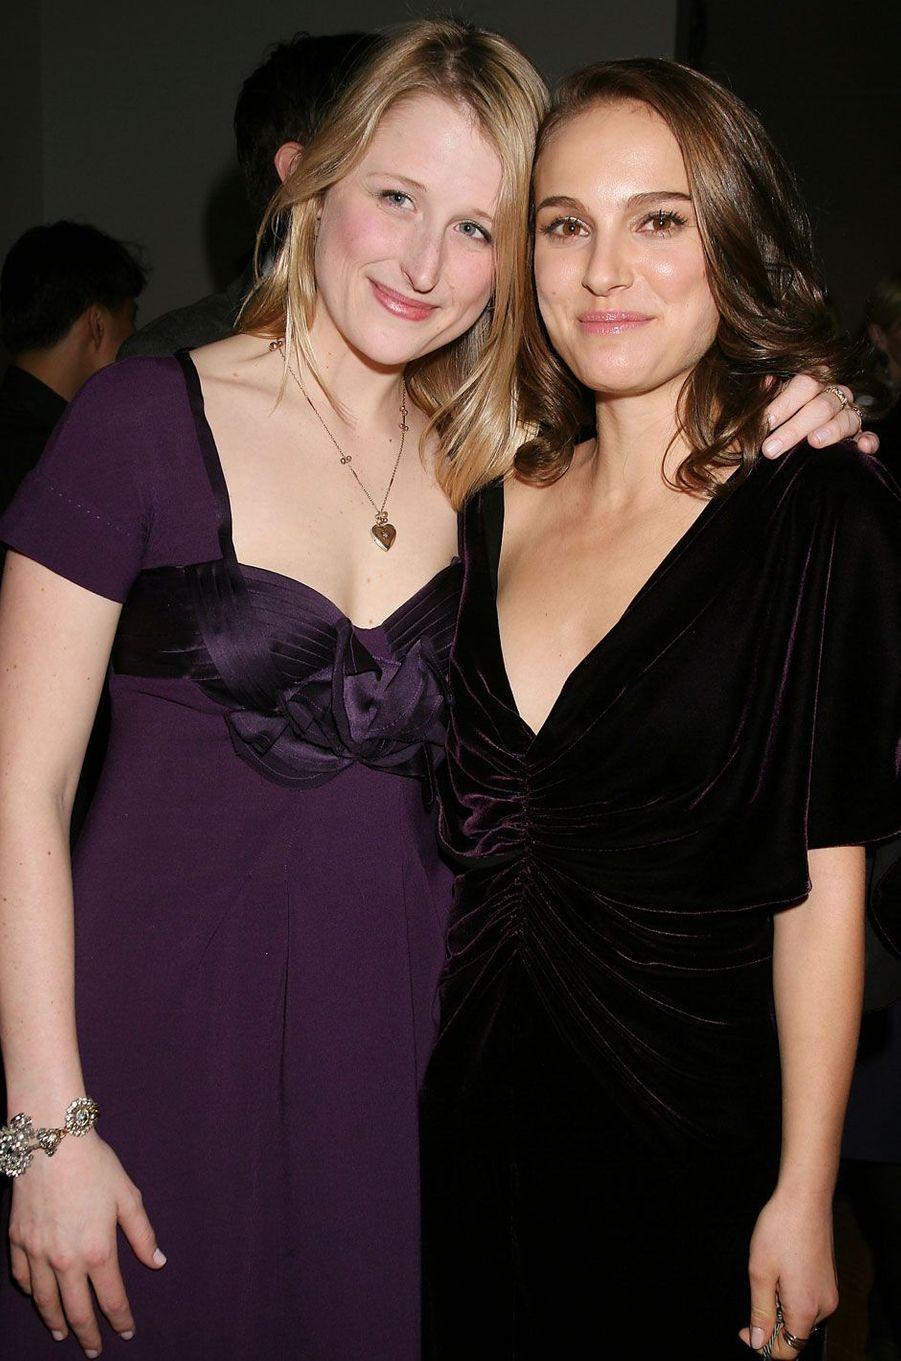 Mamie Gummer et son amie Nathalie Portman en 2008.